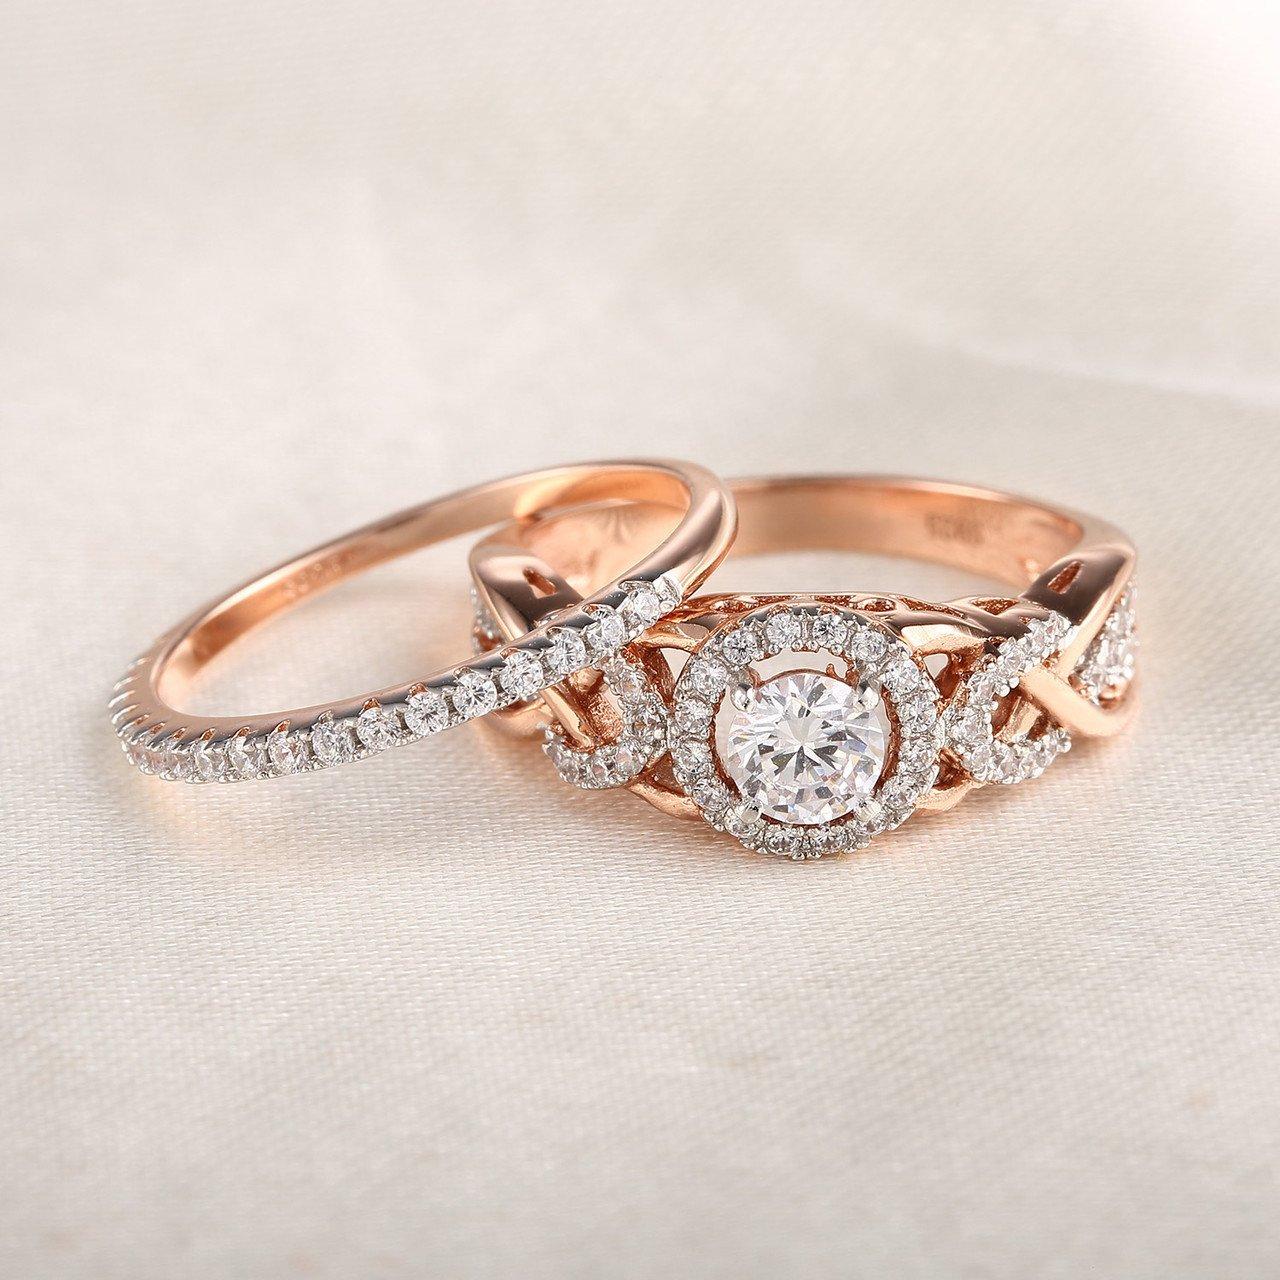 GuqiGuli Twist Shank Cubic Zirconia Bridal Engagement Wedding Ring Set in Rose Gold Plate Sterling Silver